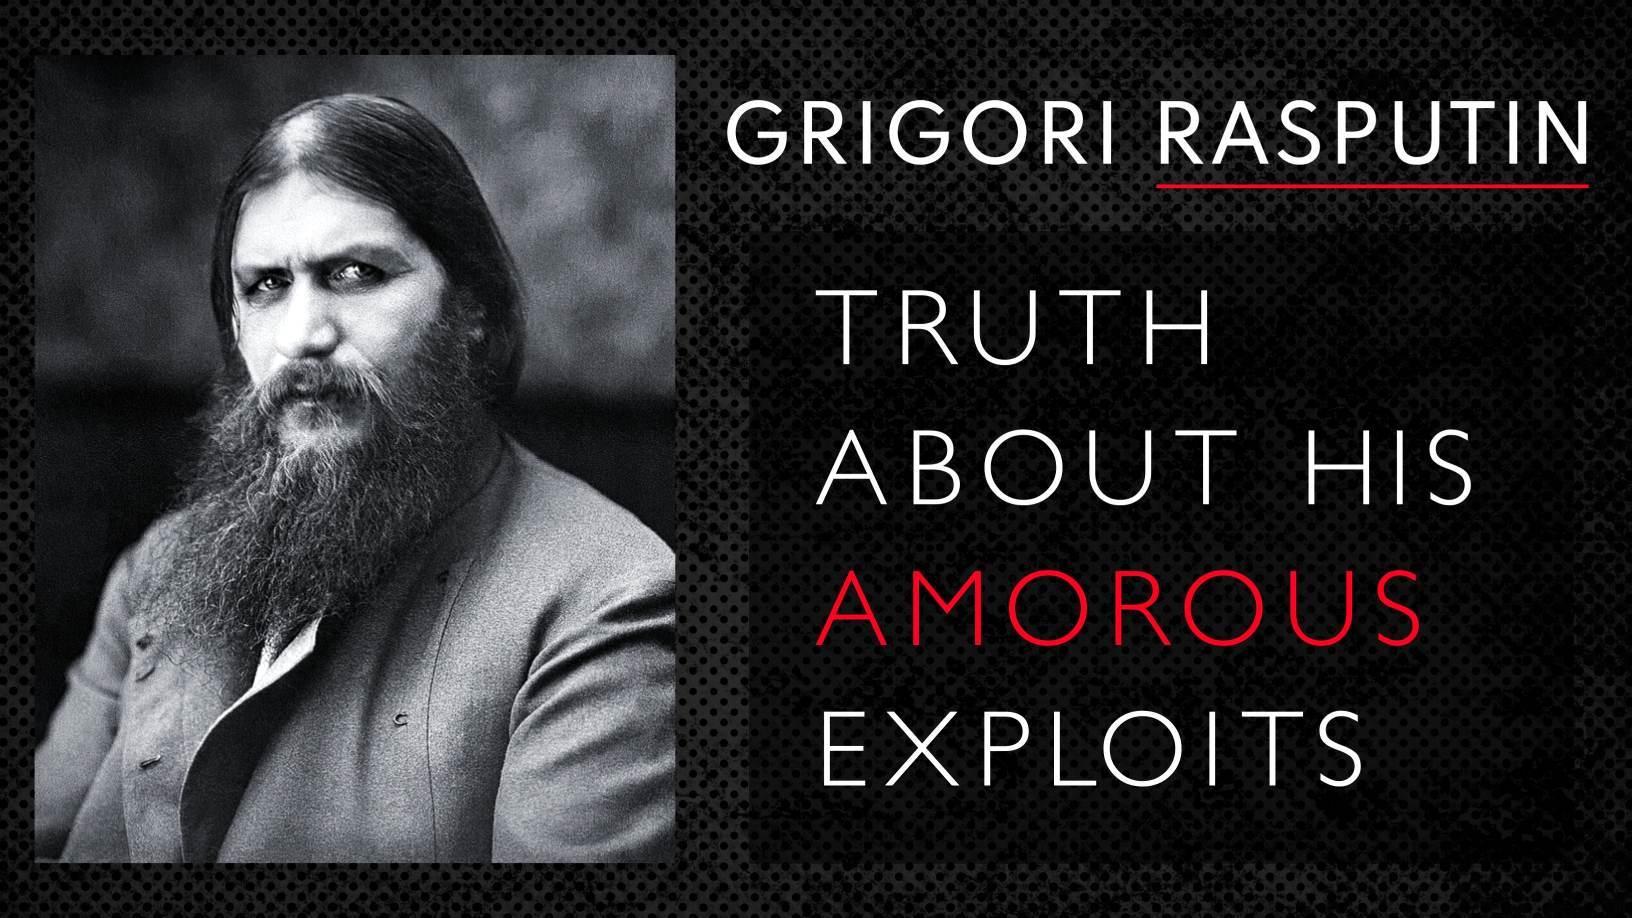 Truth and lies about amorous exploits of Grigori Rasputin 5